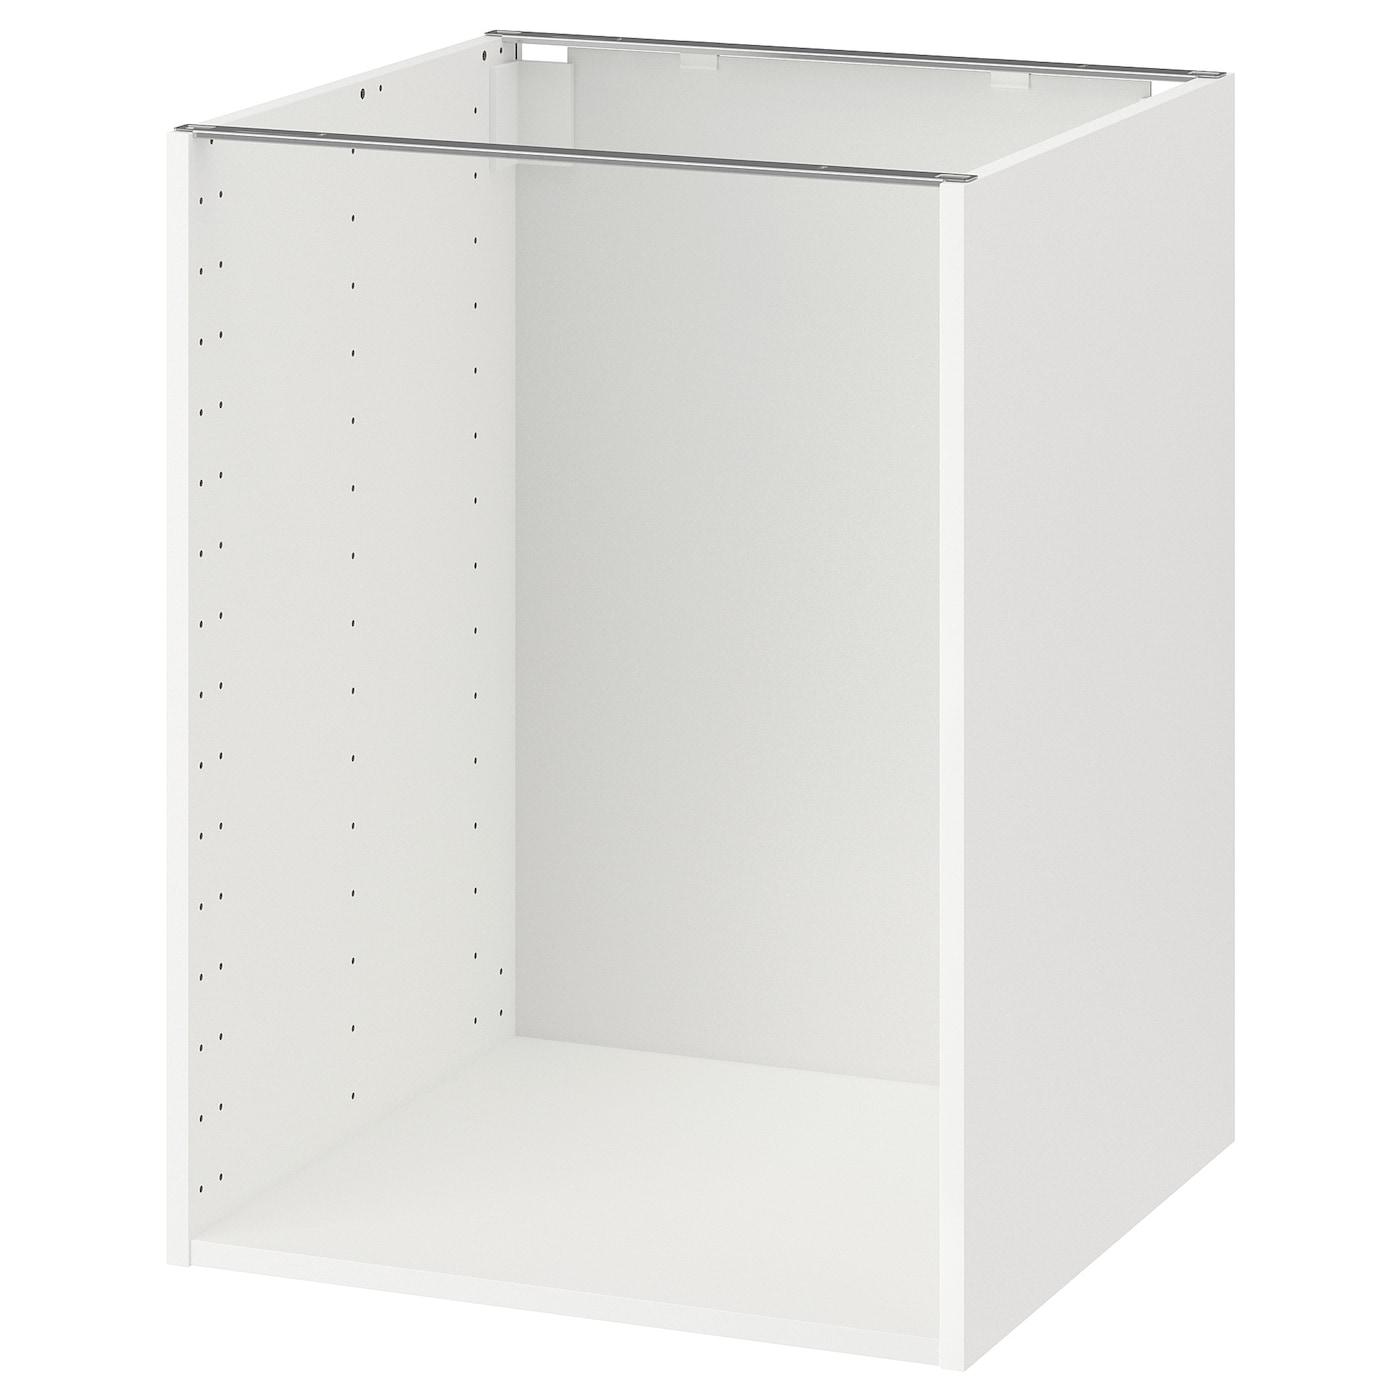 Kitchen Plinths - Cabinet Legs - Open Kitchen Cabinets - IKEA